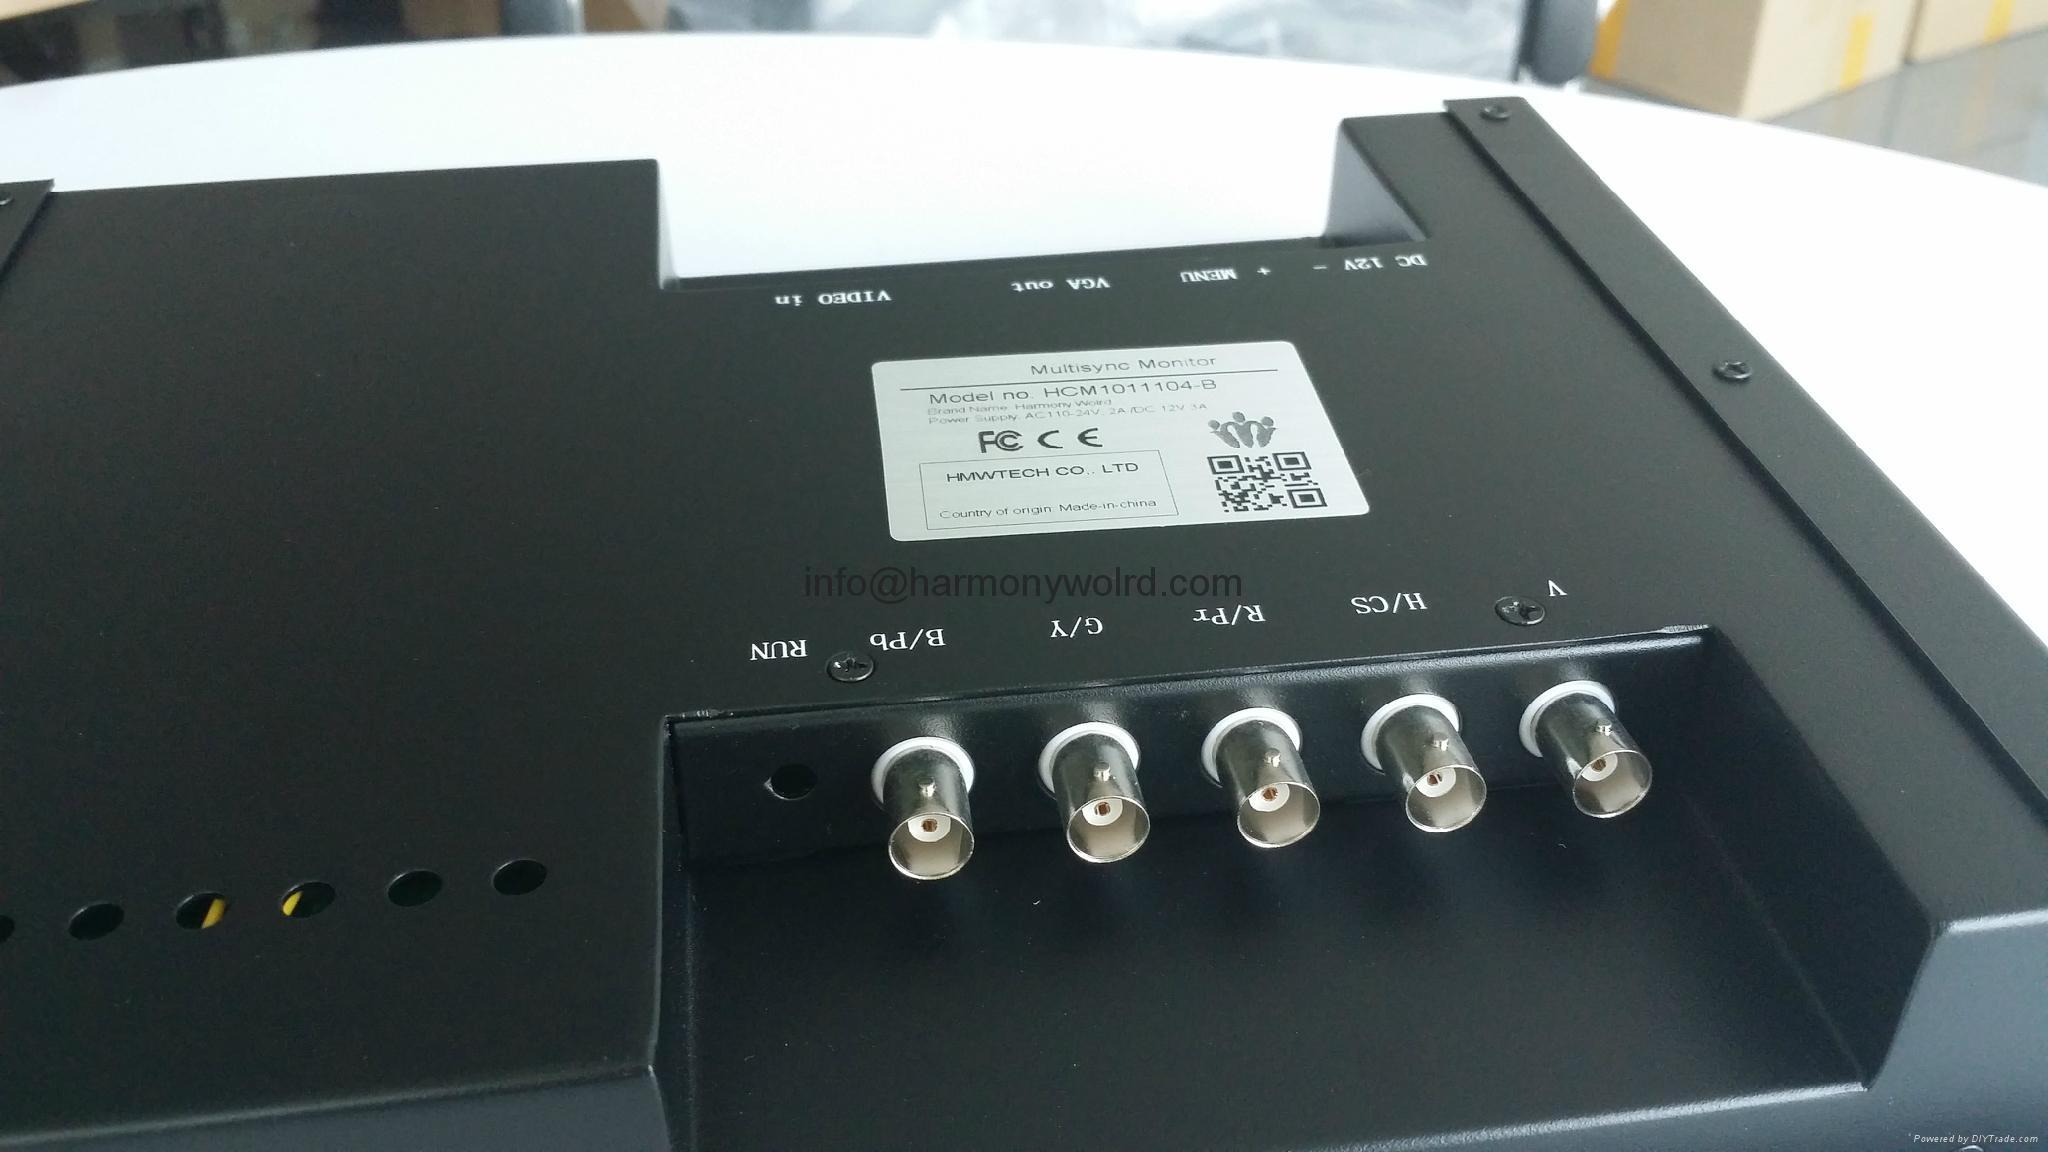 Upgrade Monitor Siemens Sinumerik SM-1200 805 (SM-1200) 12 inch CRT To LCDs   6